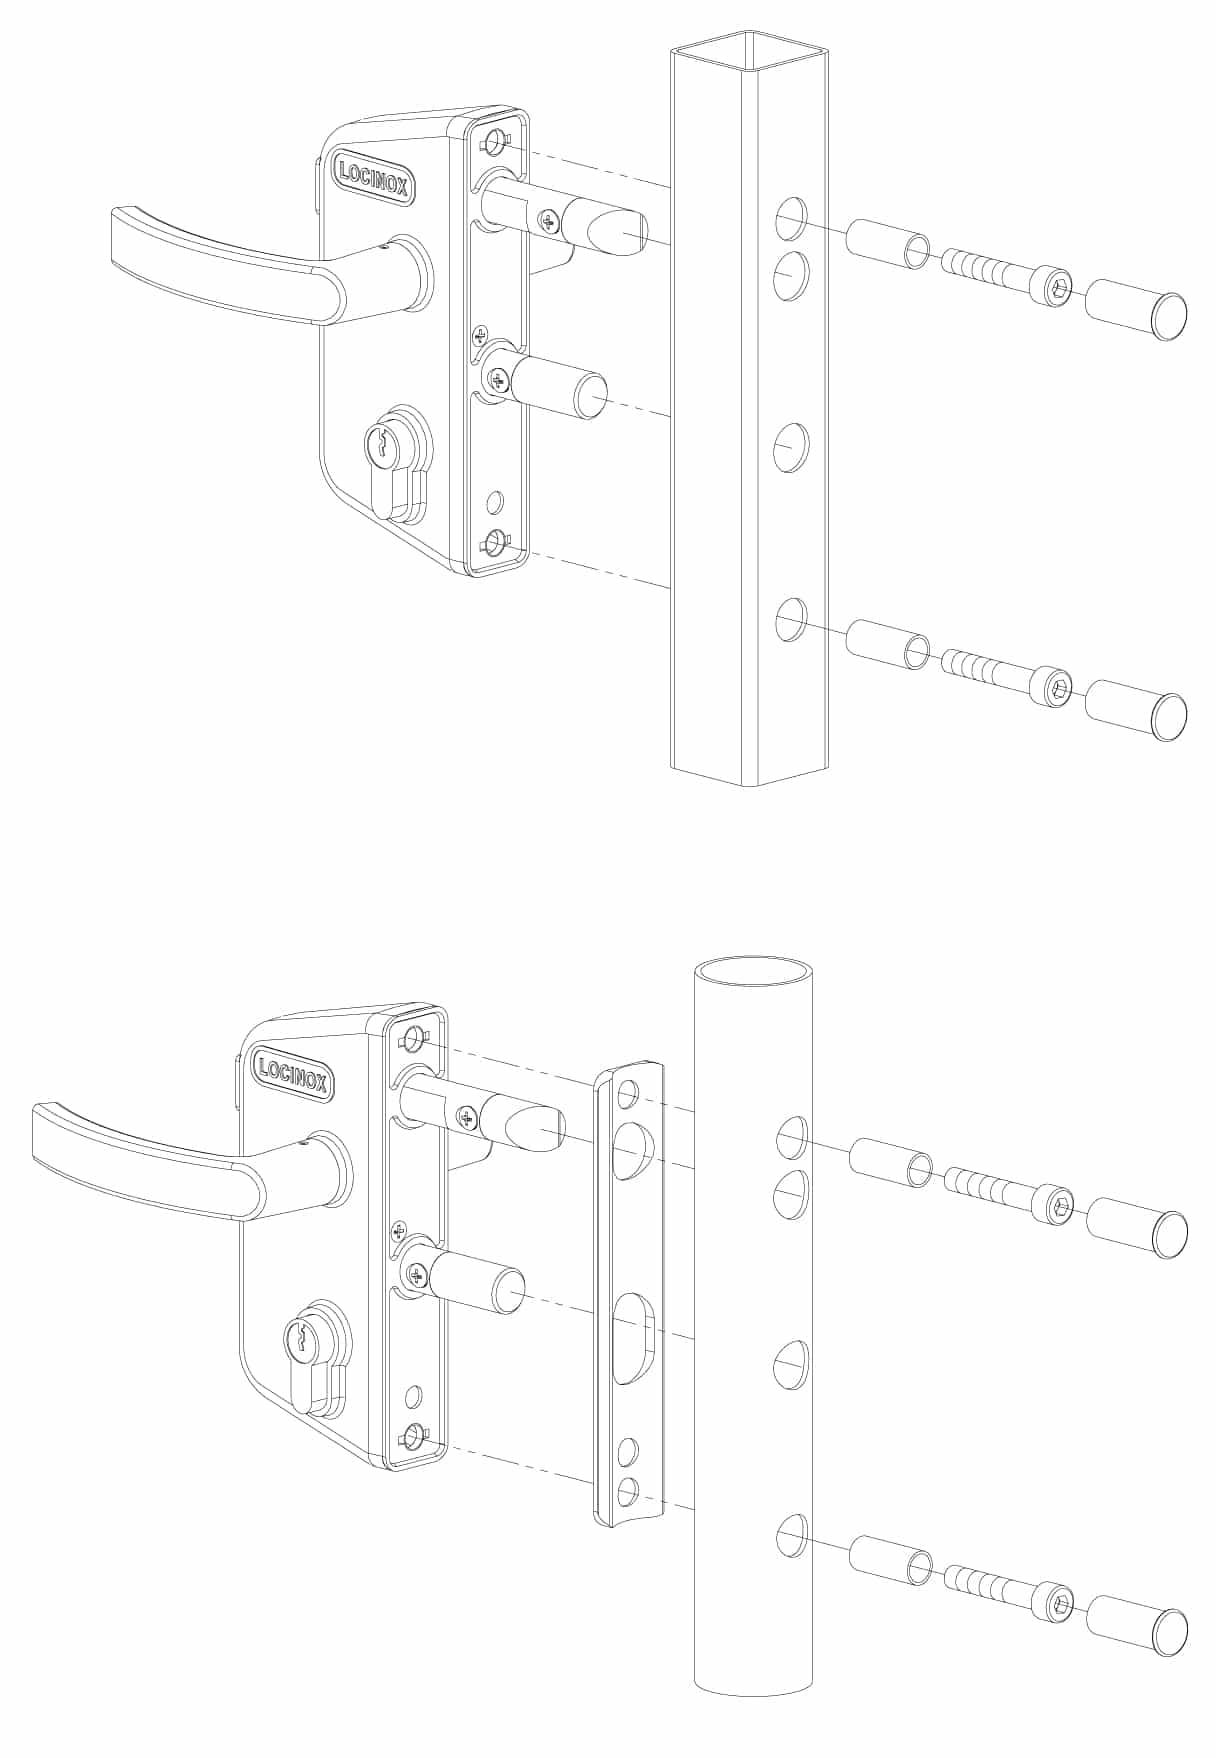 LAKZ4040P1L Locinox garden gate lock install diagram